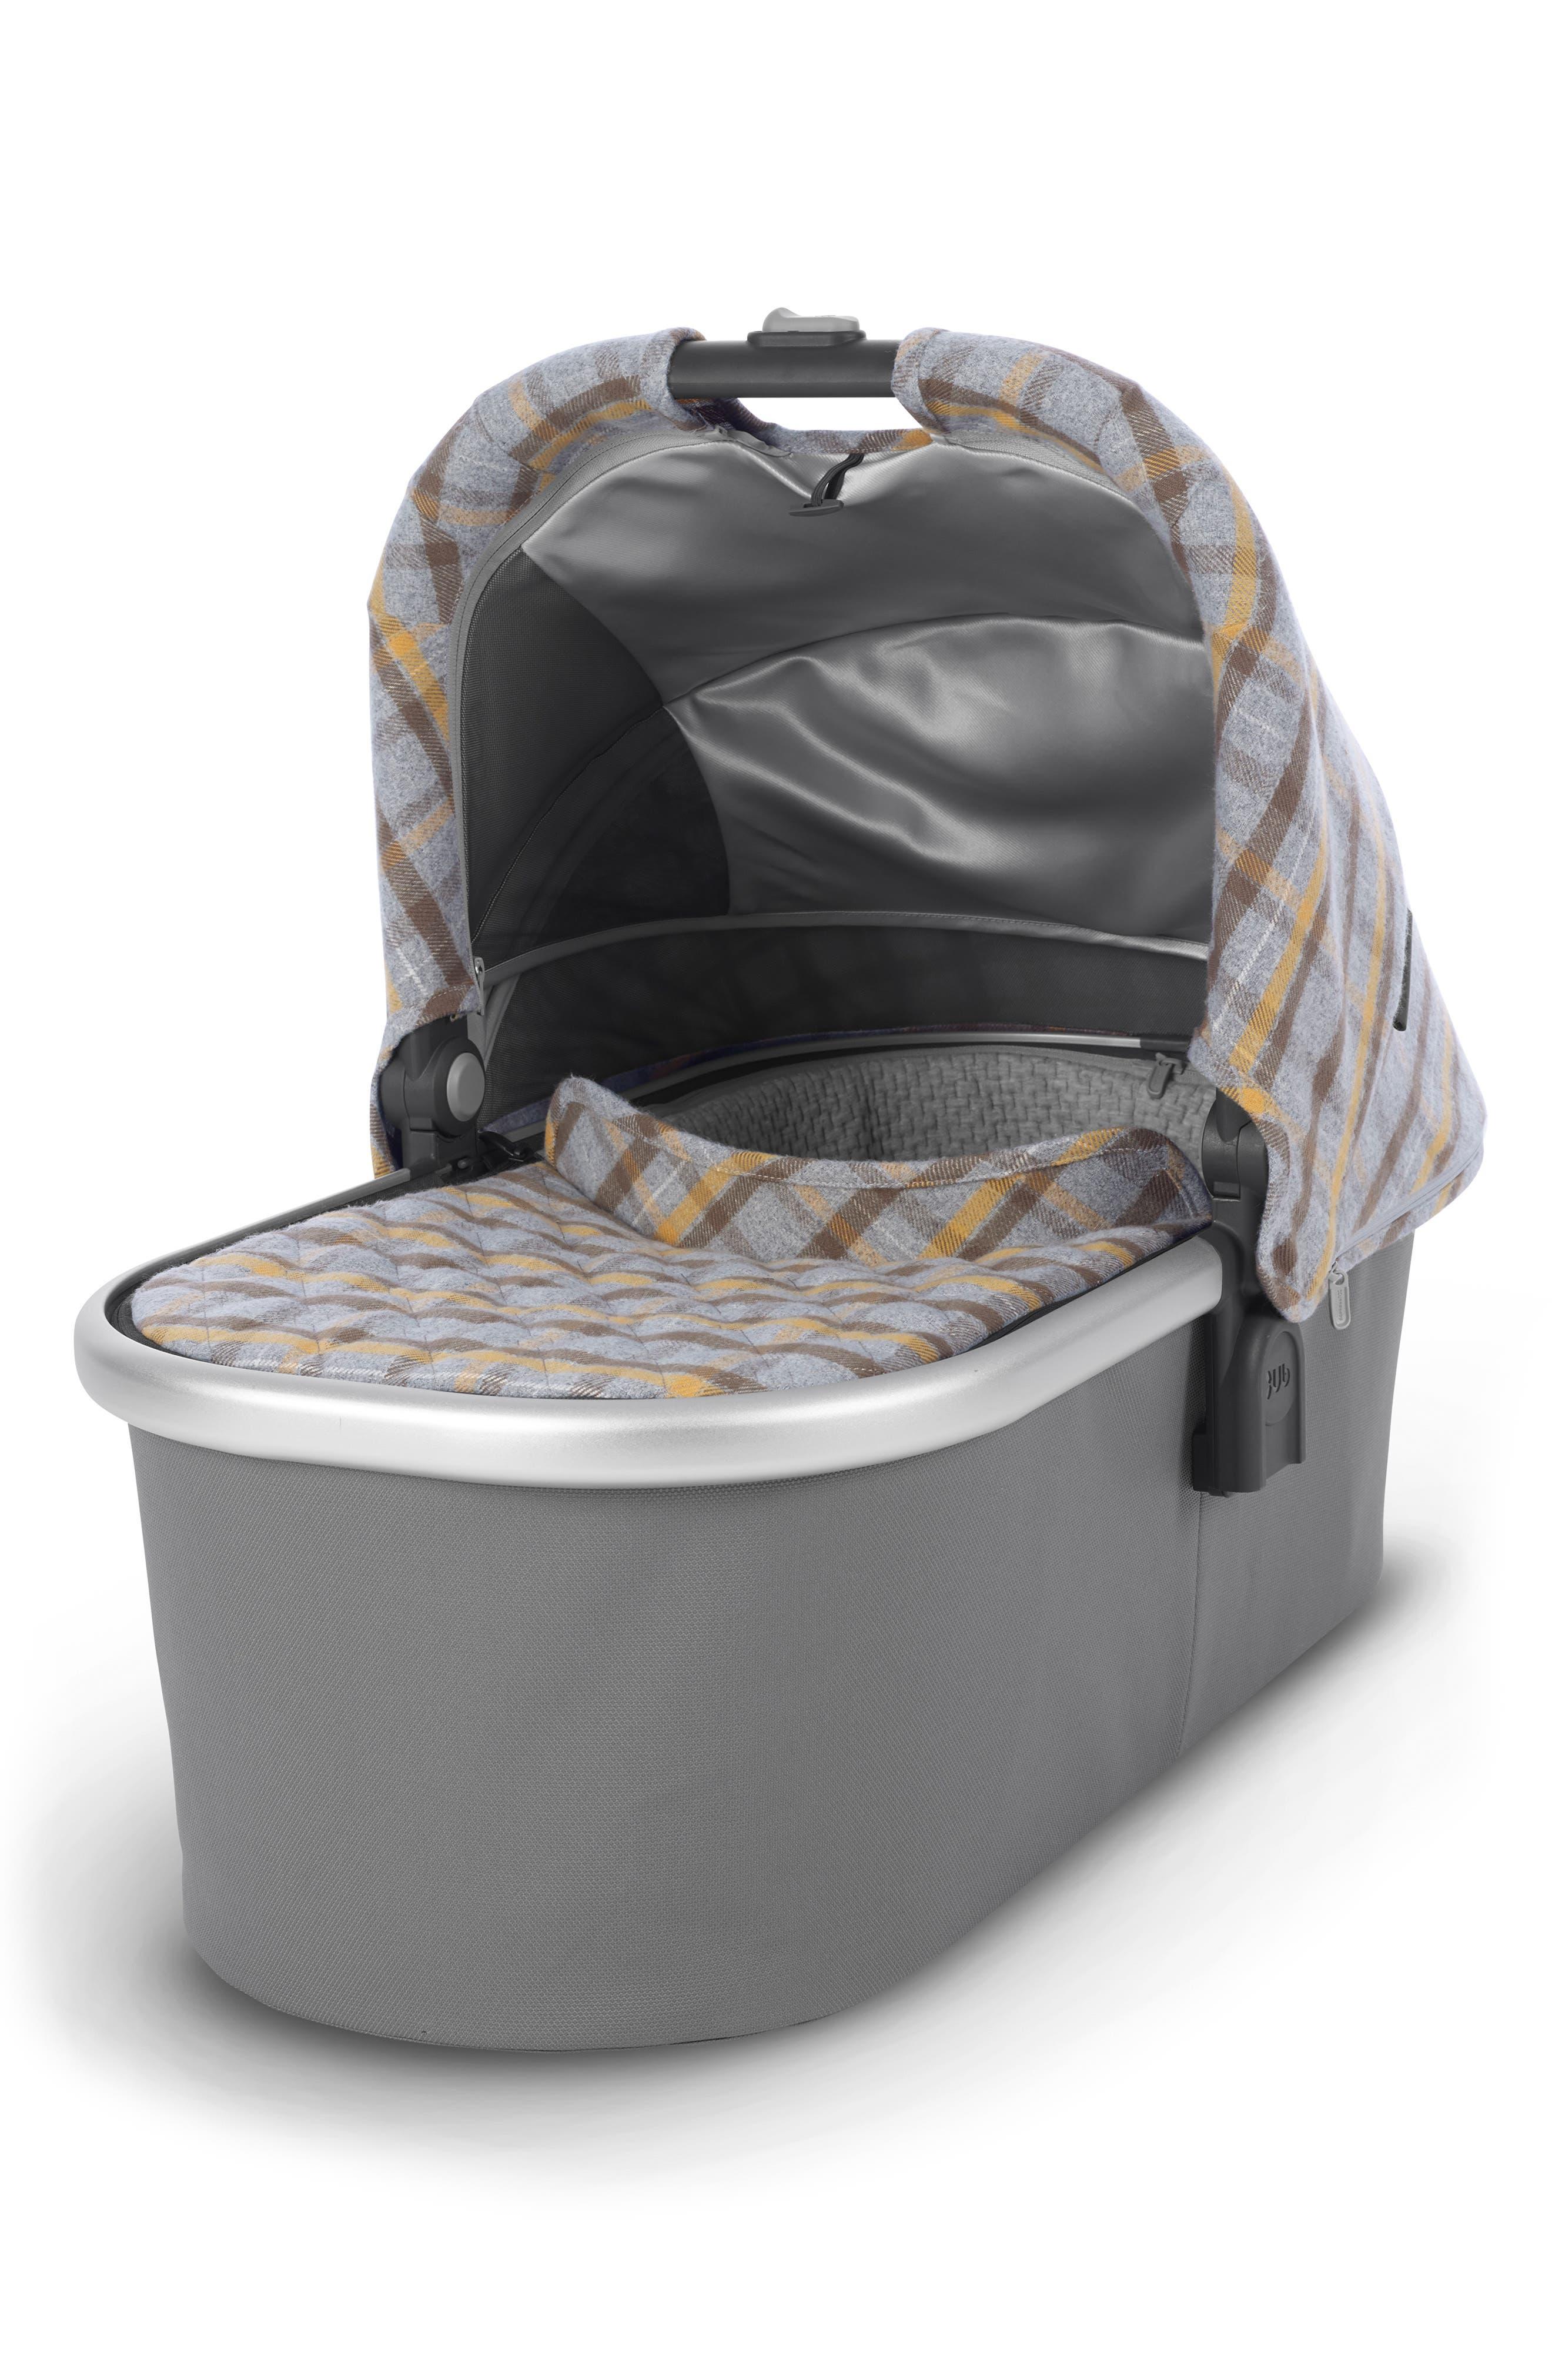 VISTA Spenser Convertible Stroller with Bassinet & Toddler Seat,                             Alternate thumbnail 2, color,                             GREY/ YELLOW TARTAN